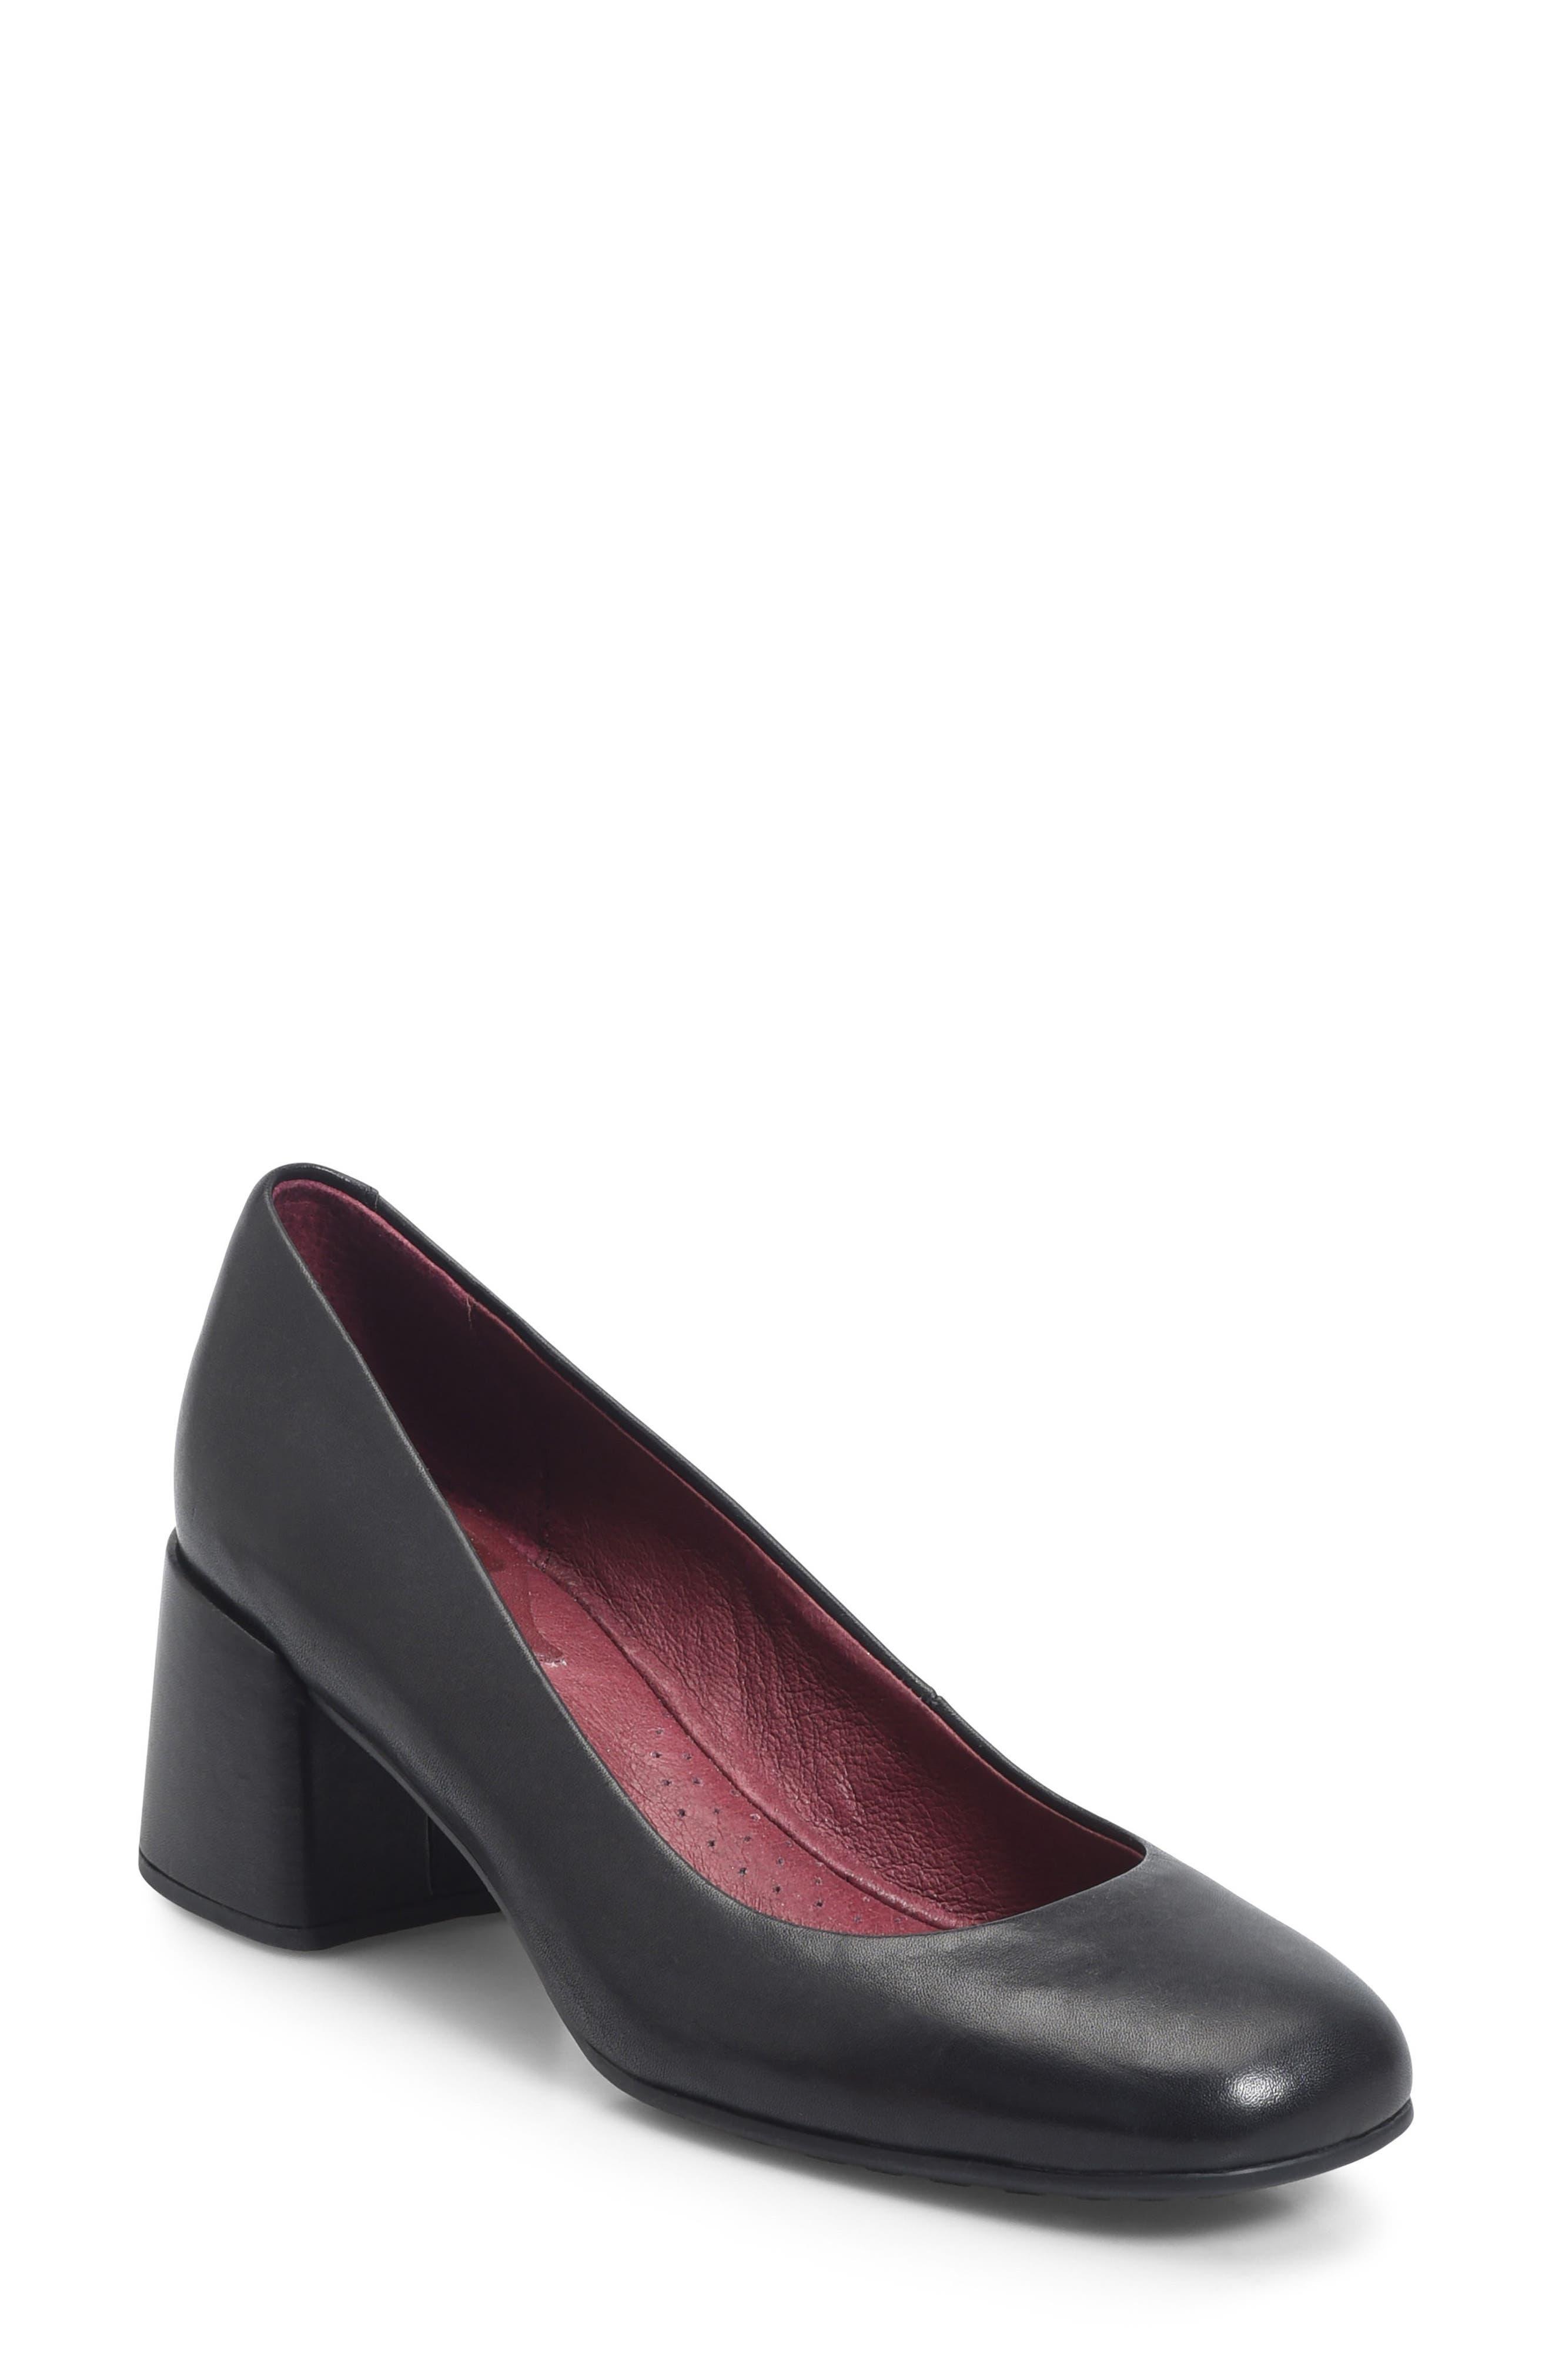 Magnolia Block Heel Pump,                             Main thumbnail 1, color,                             Black Leather